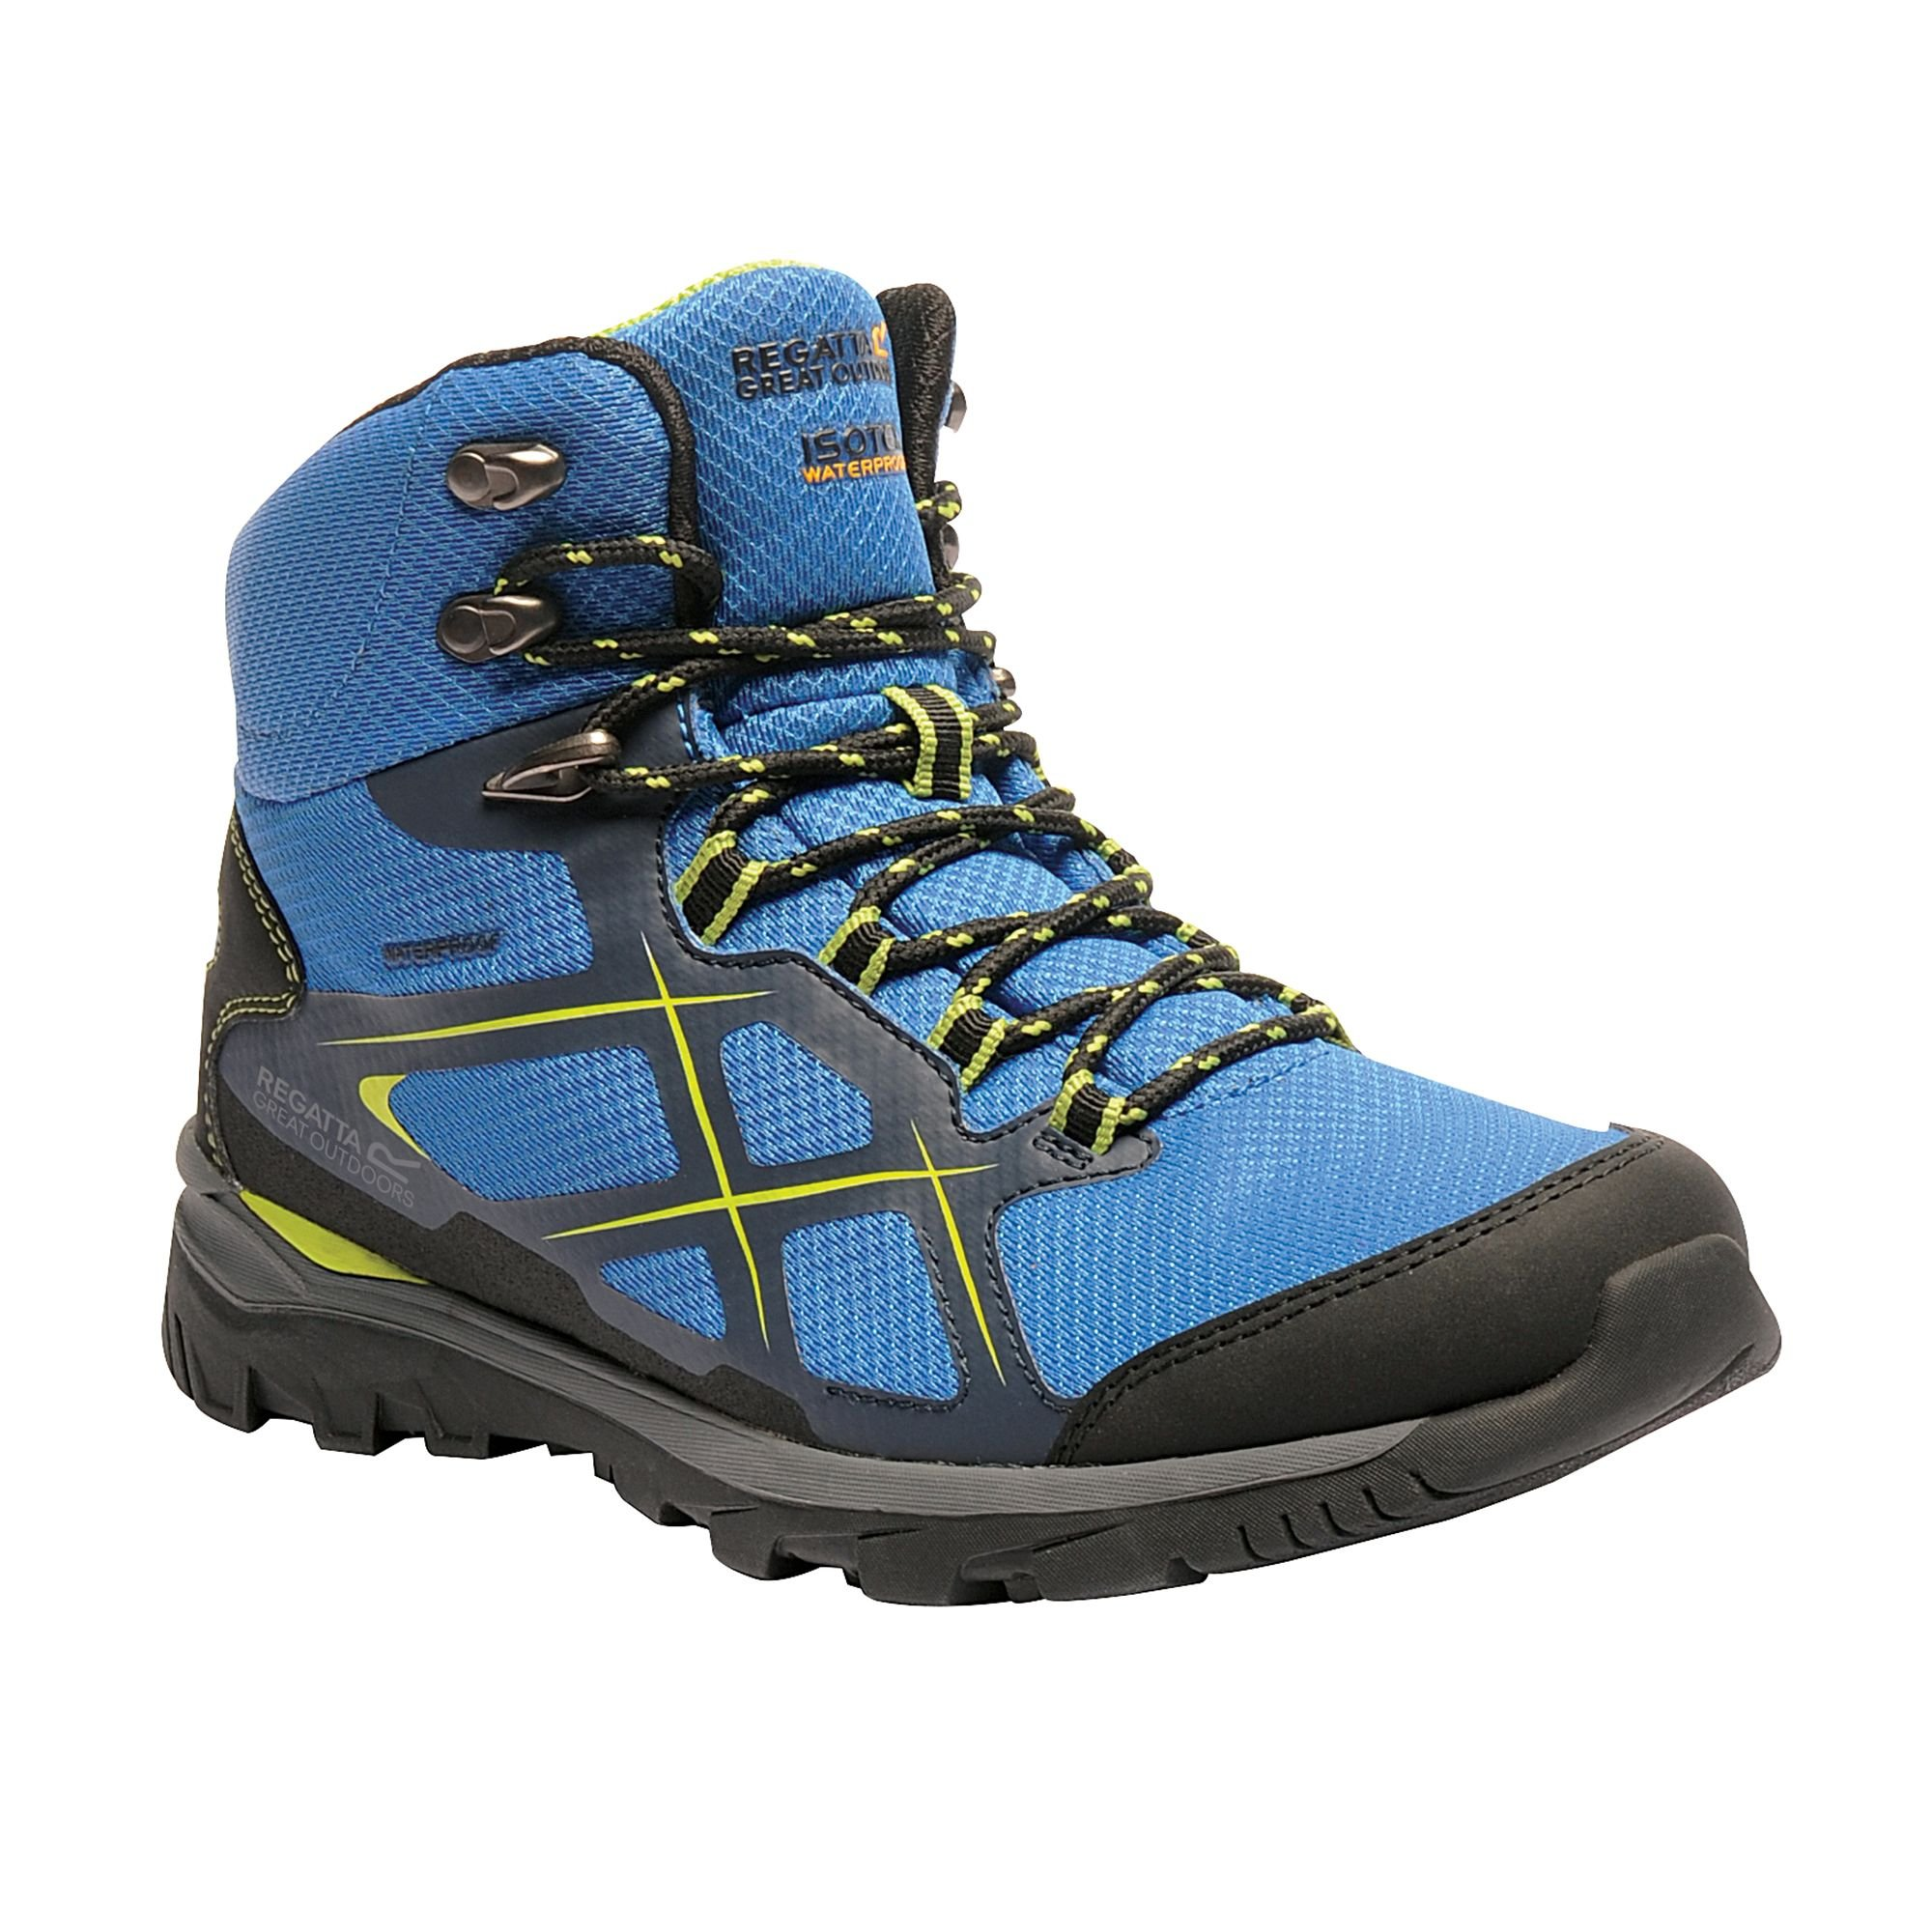 Regatta Great Outdoors Mens Kota Mid Walking Boot (10 US) (Navy Blazer/Lime Green) by Regatta (Image #4)